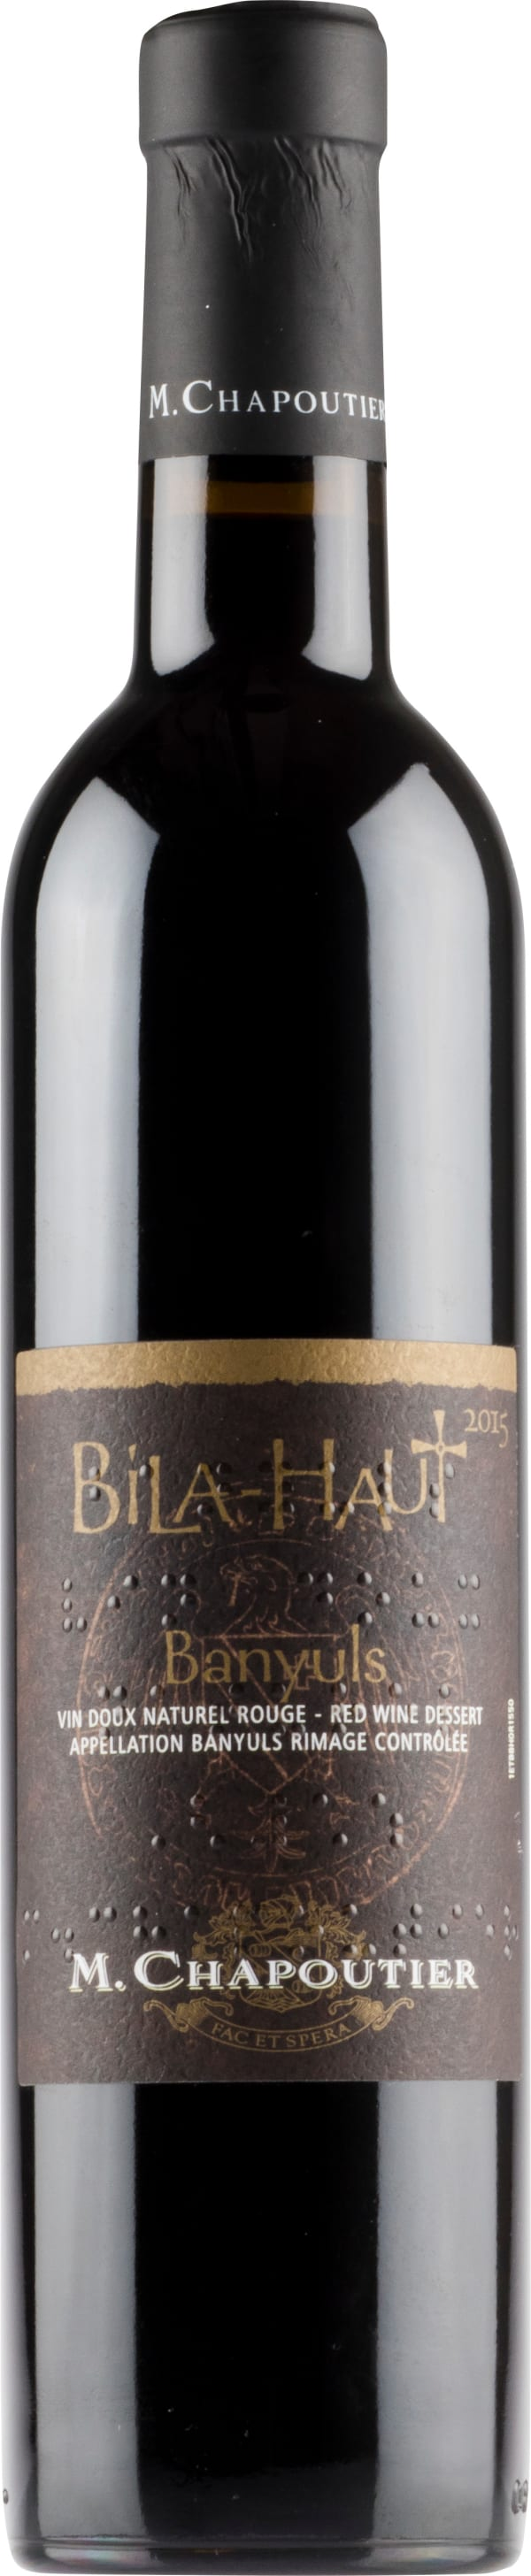 Chapoutier Bila-Haut Banyuls Rimage 2015